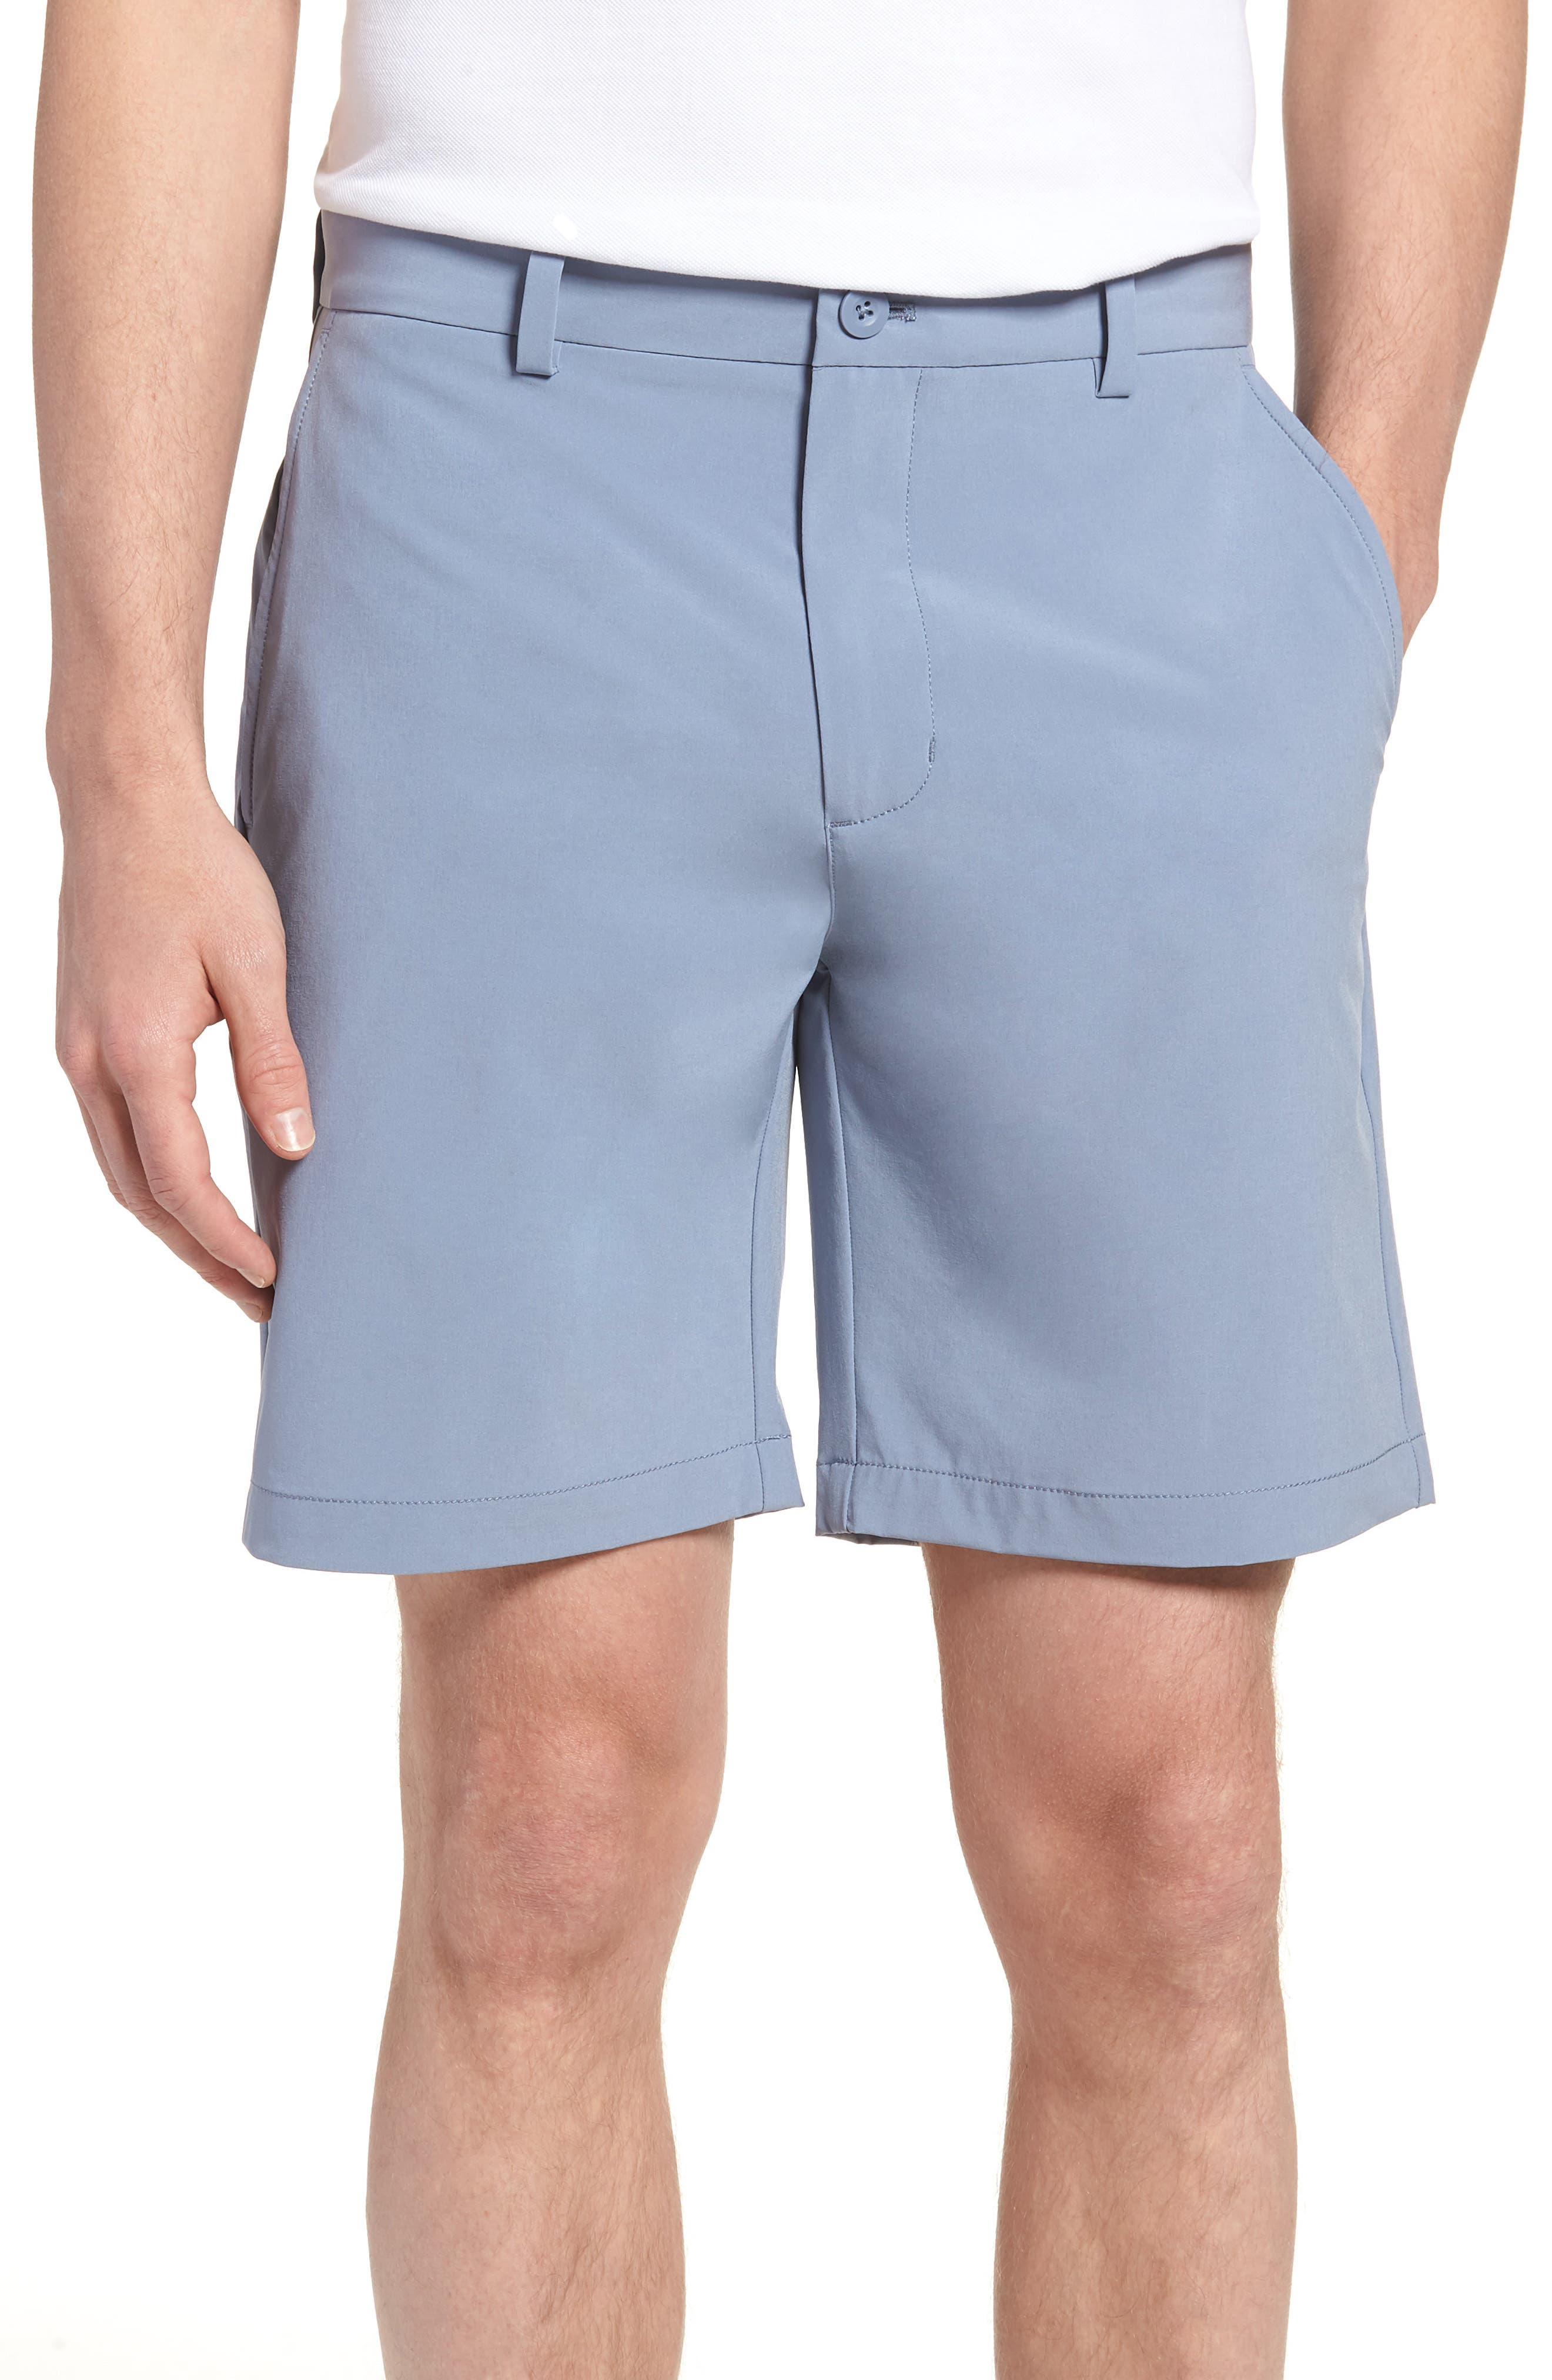 8 Inch Performance Breaker Shorts,                             Main thumbnail 1, color,                             423